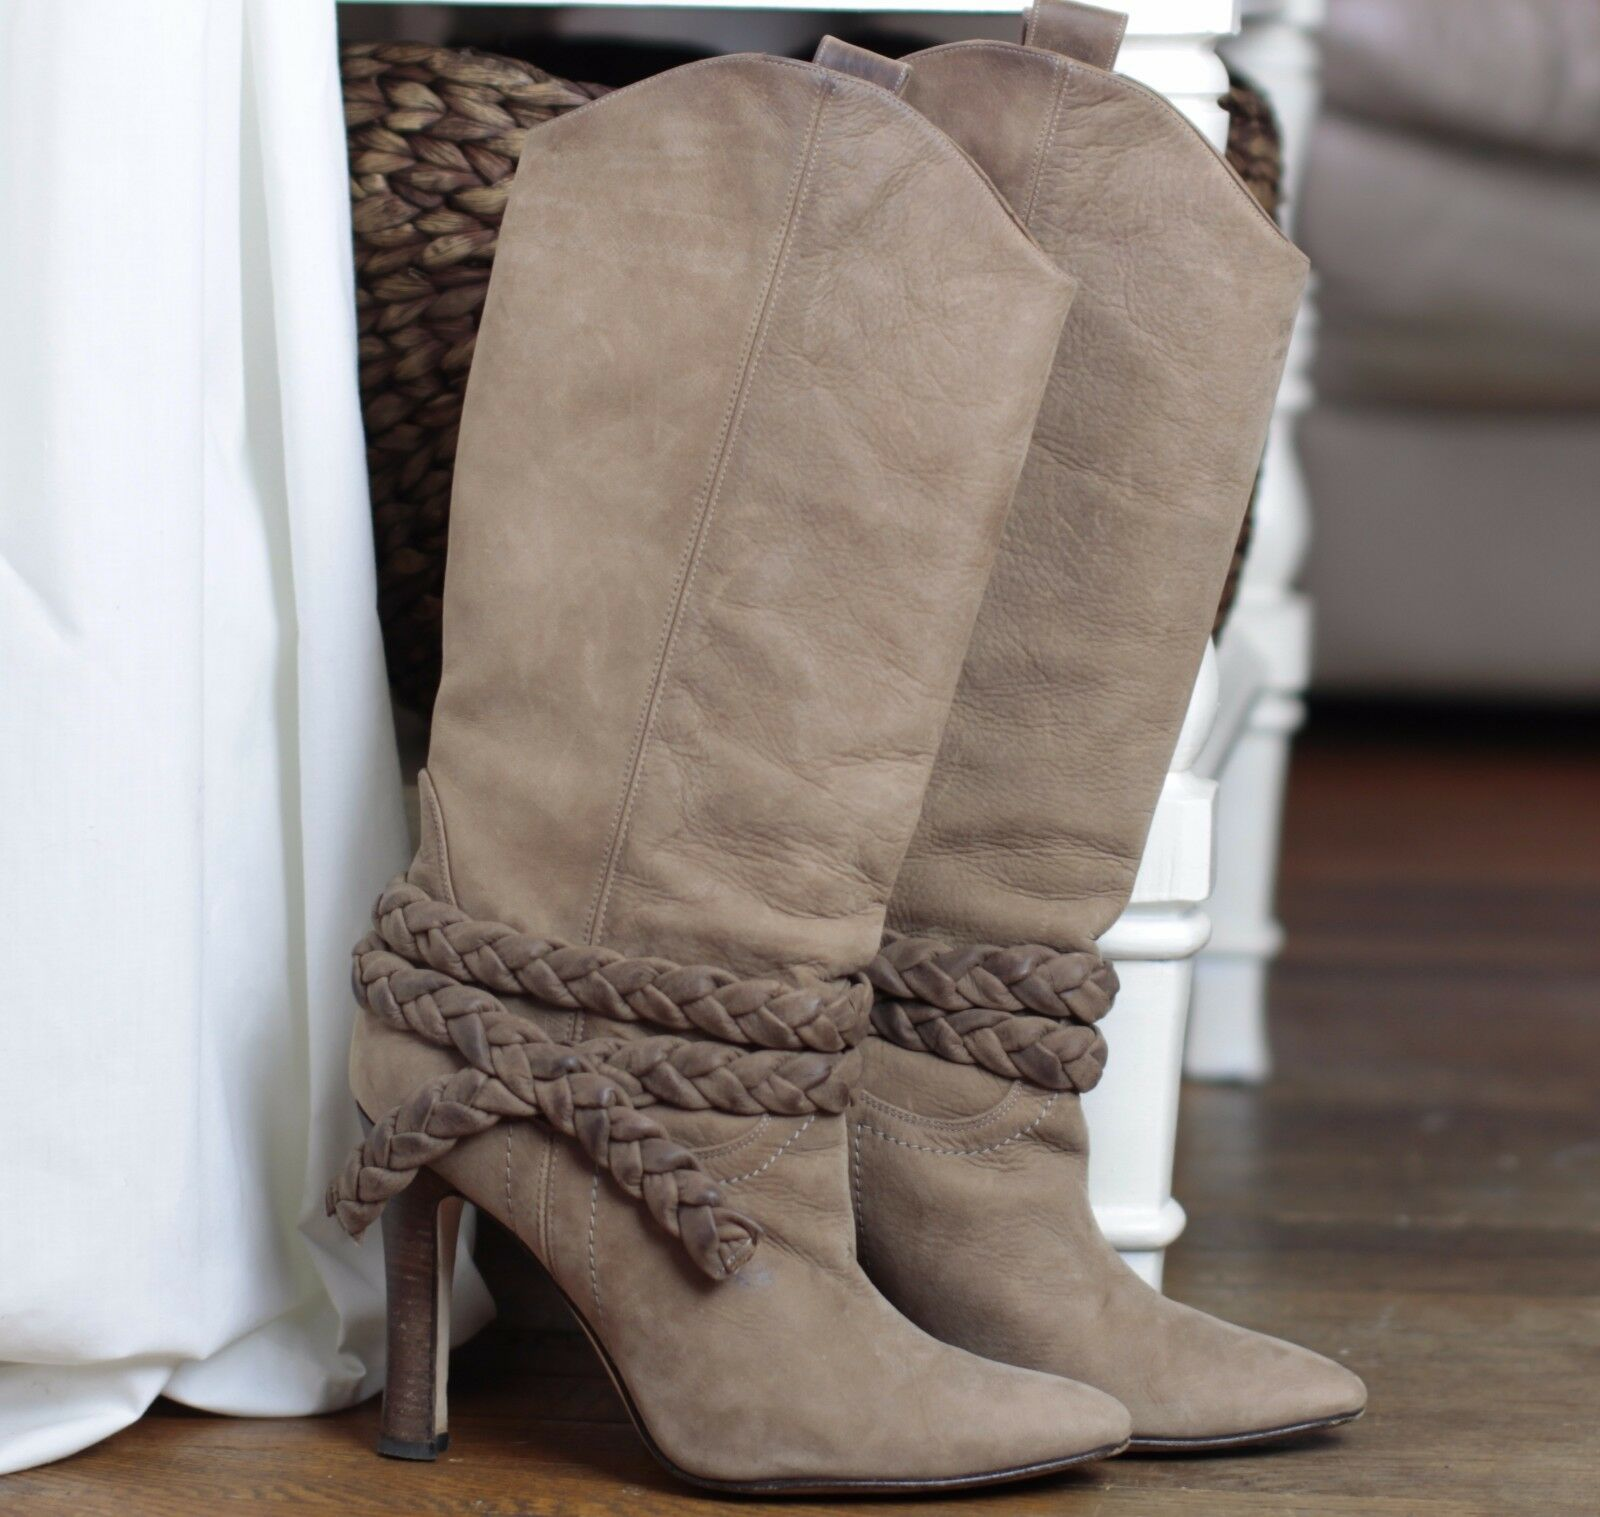 MANOLO BLAHNIK Tan Suede Pointed Toe Braid Trim Knee High Western Boots Sz 38